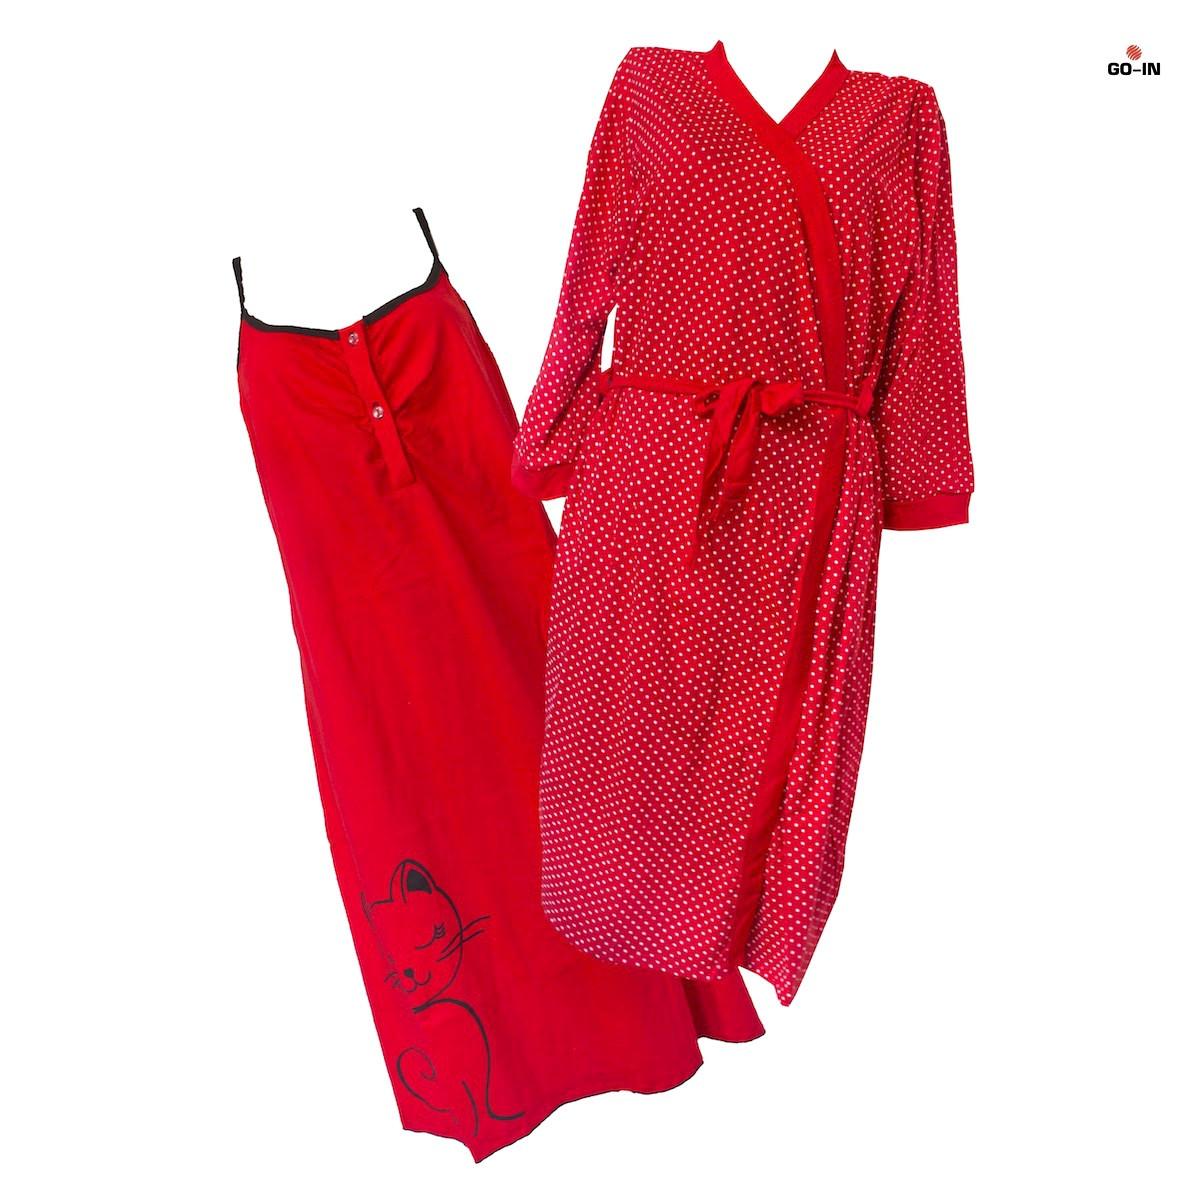 7f4b1ffdf1c Комплект халат + ночная рубашка 52-54 р. стрейч кулир  продажа